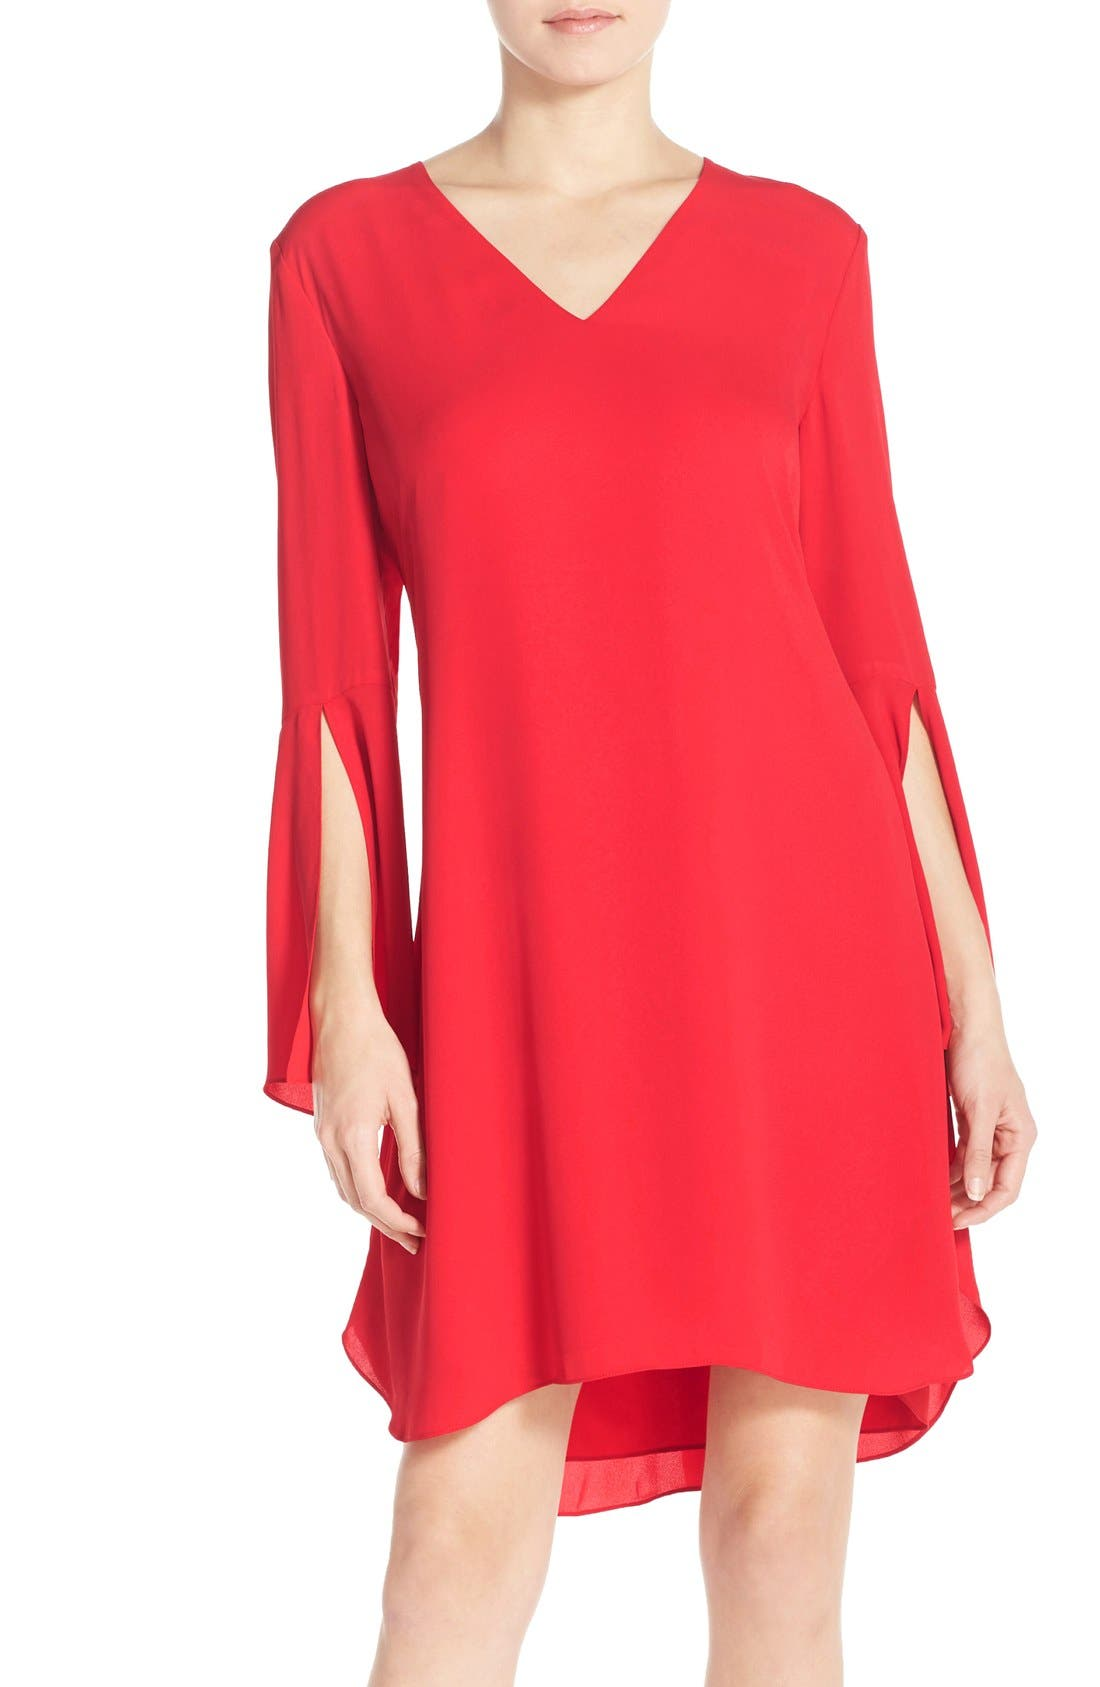 Main Image - Chelsea28 Bell Sleeve Chiffon A-Line Dress